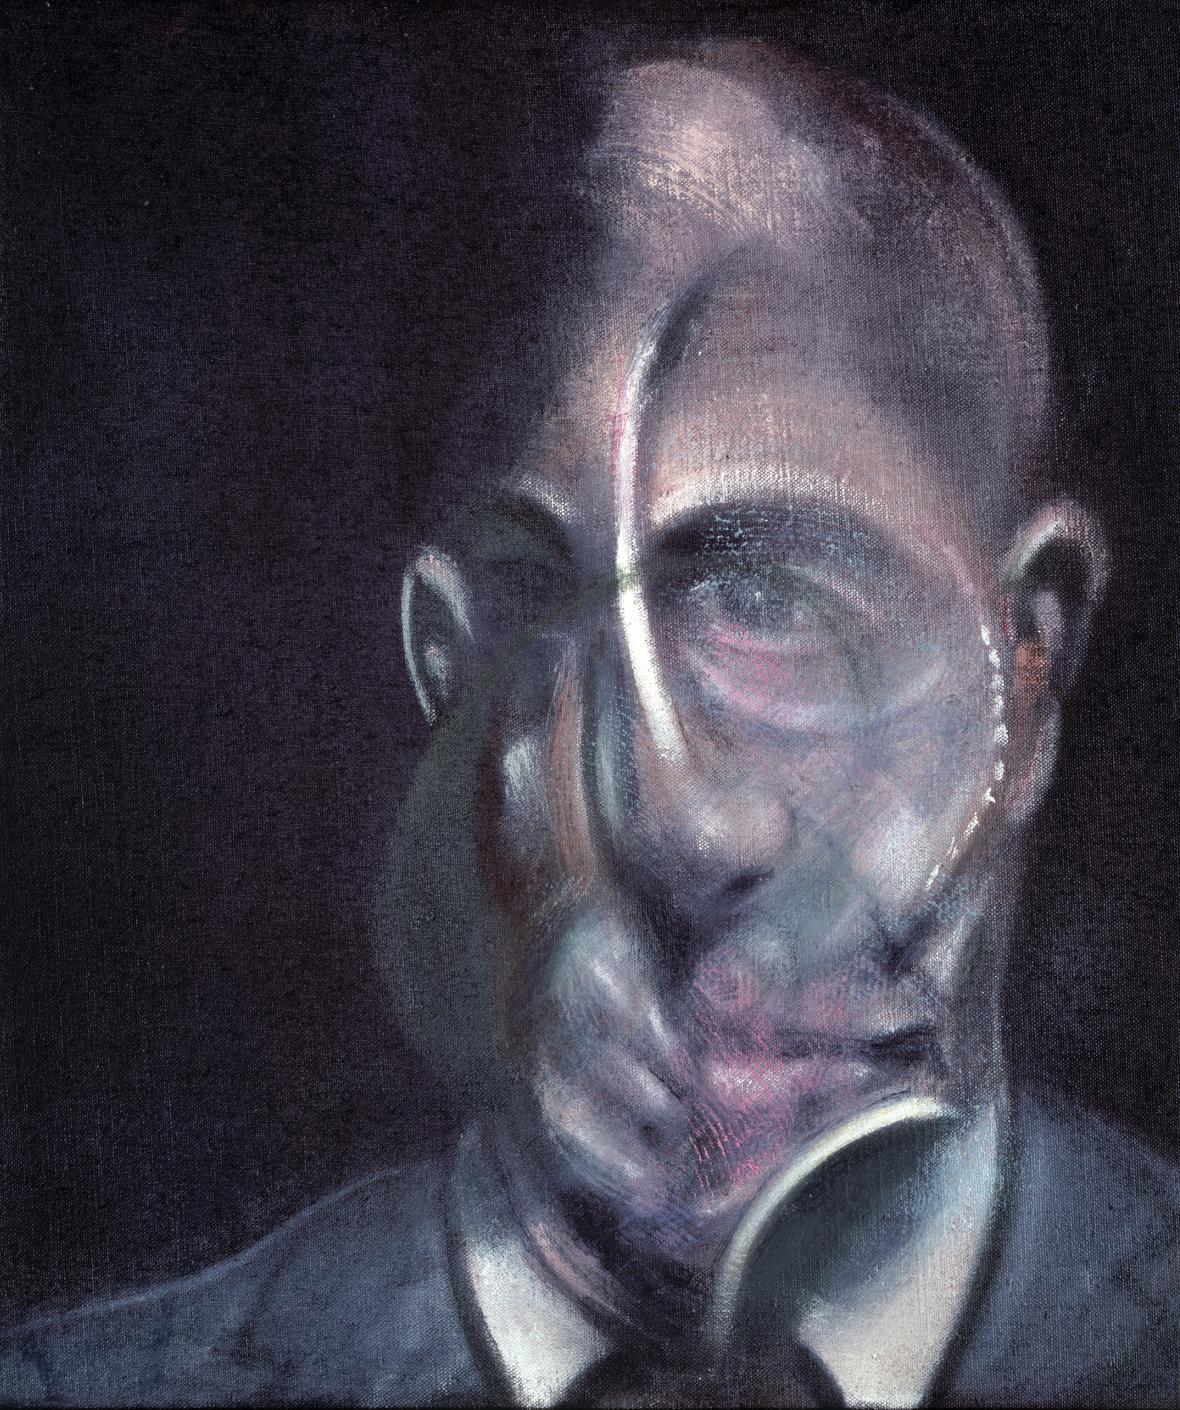 Francis Bacon / Portrét Michela Leirise, 1976